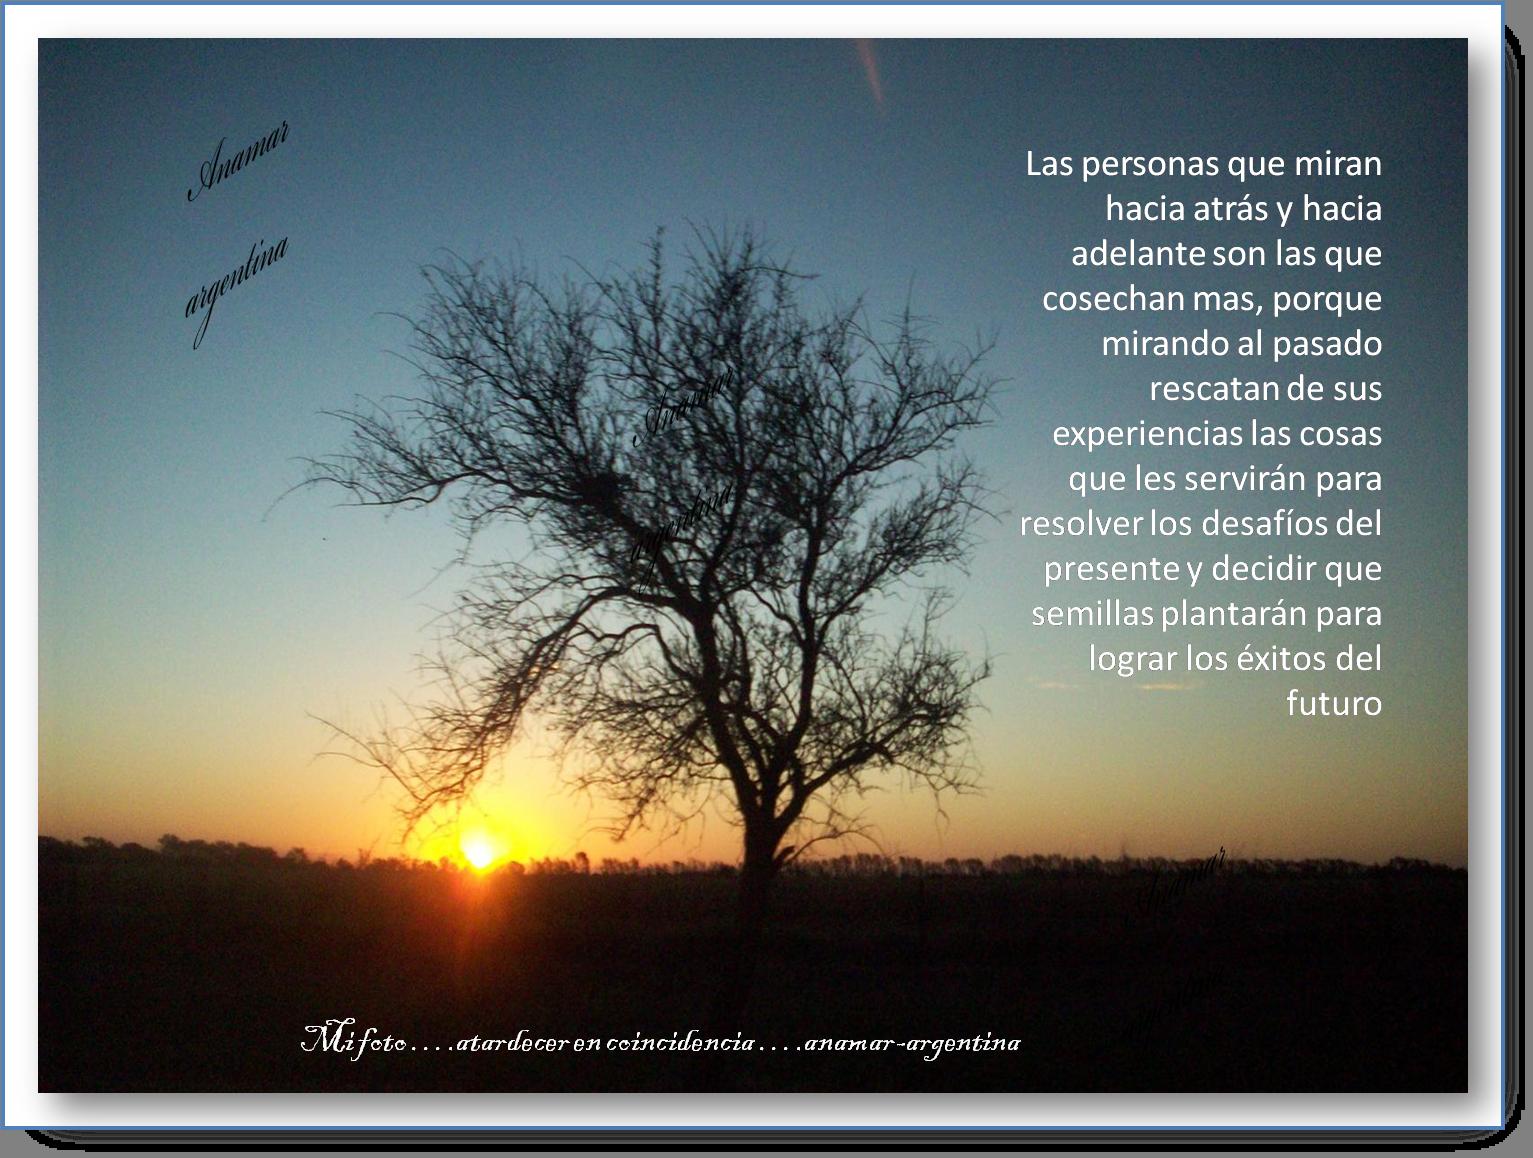 Imagenes Con Frases Atardecer Anamar Argentina Mi